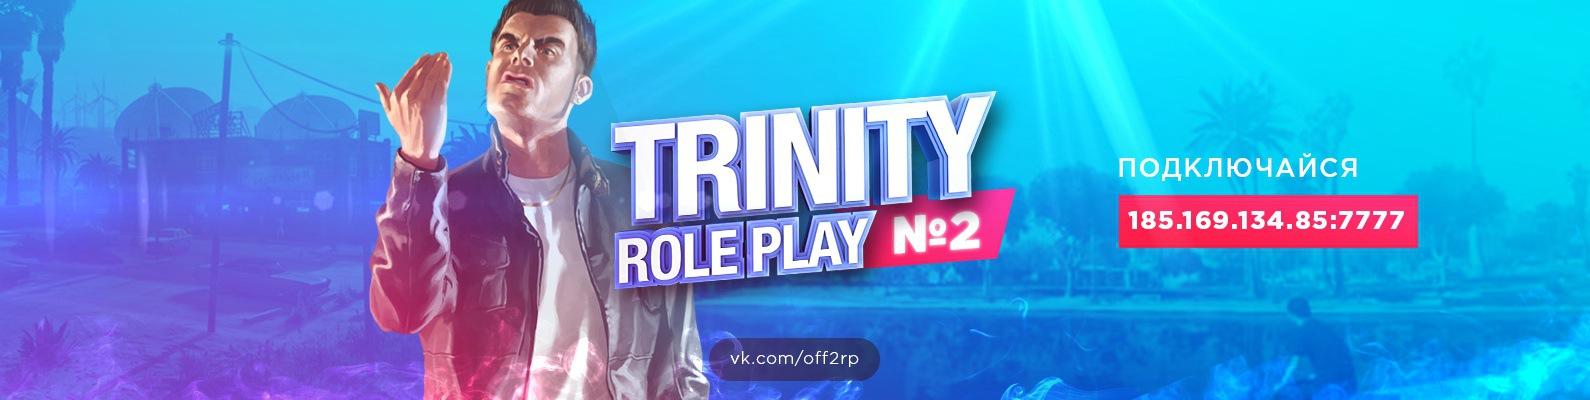 Trinity Role Play 2019